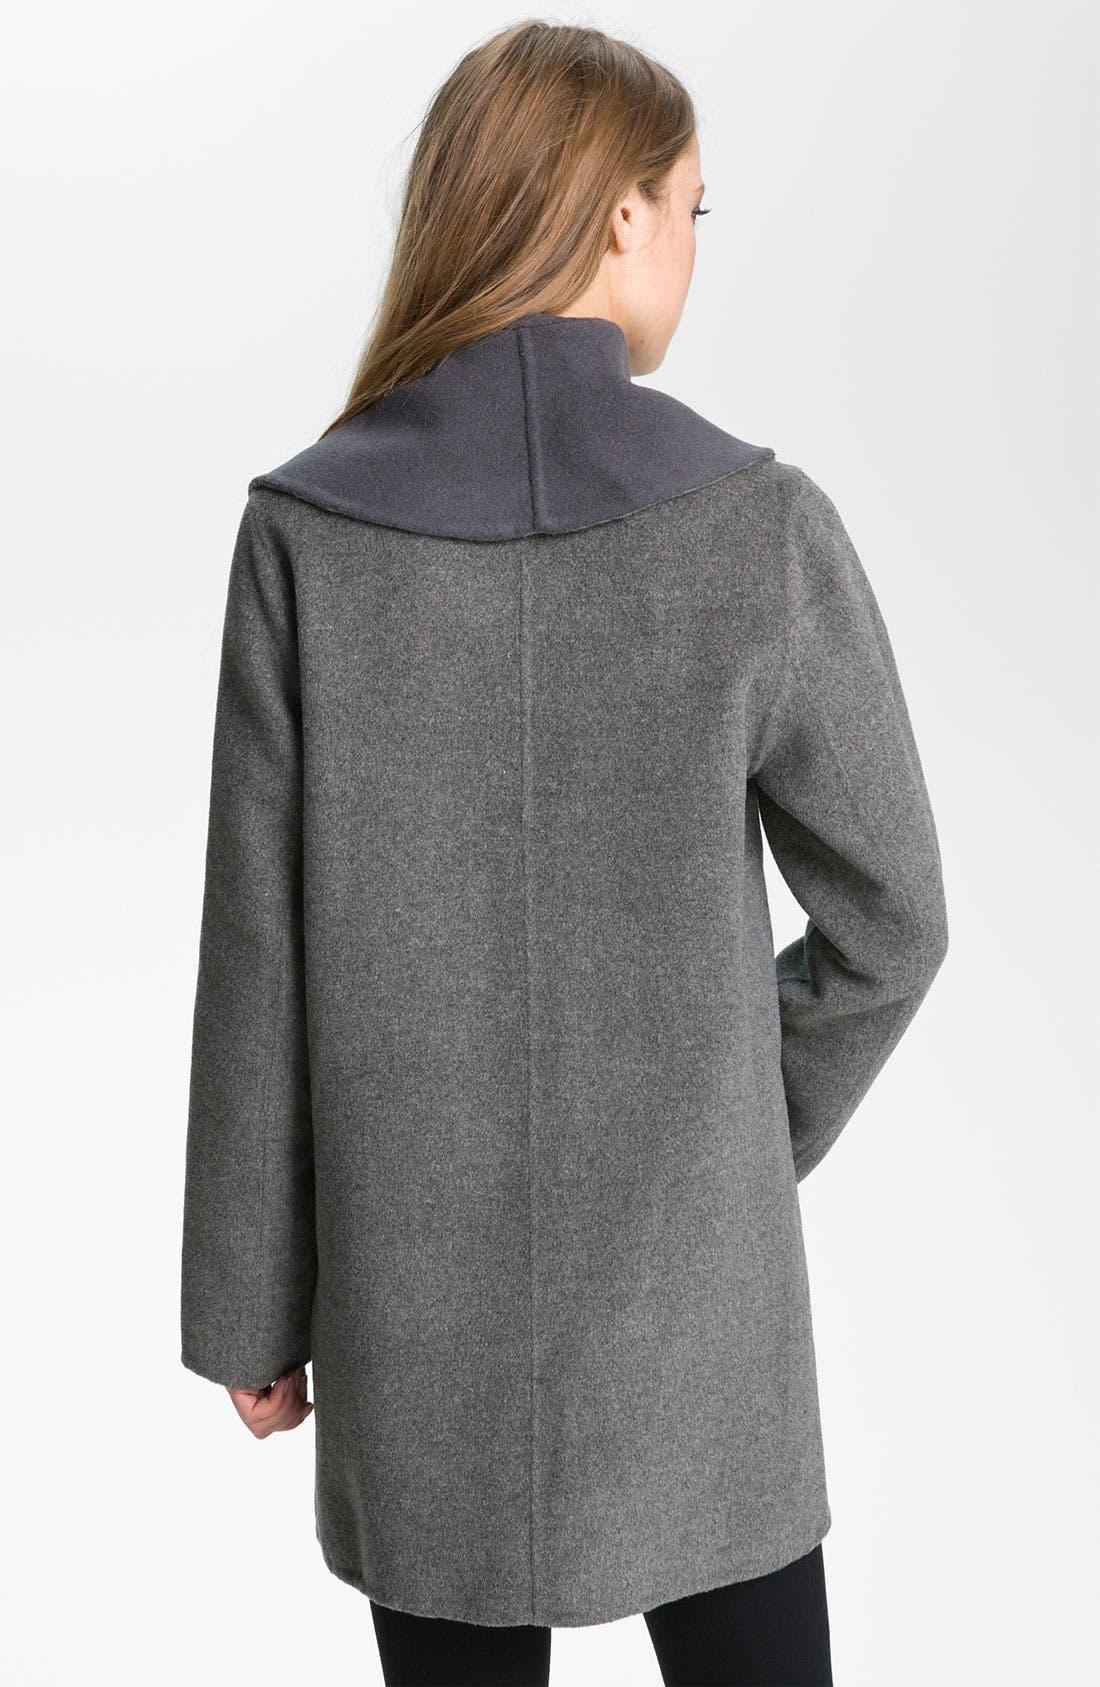 Alternate Image 2  - Joie 'Teyona' Two Tone Wool Blend Jacket